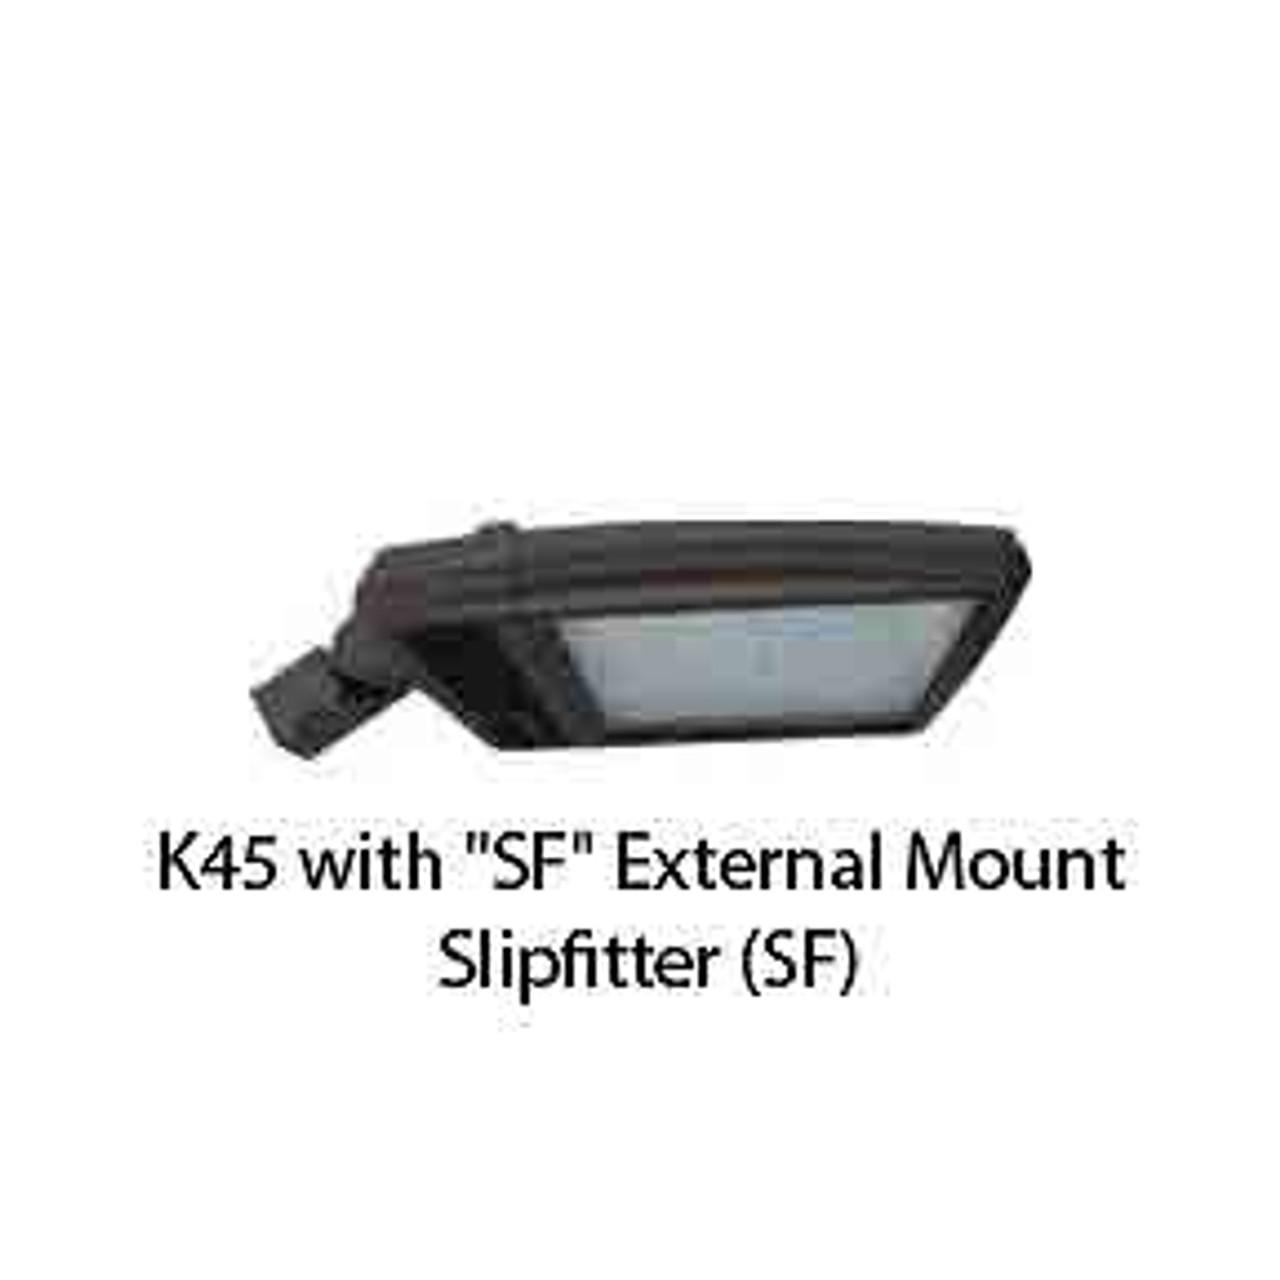 "K45 with ""SF"" External Mount Slipfitter (SF)"